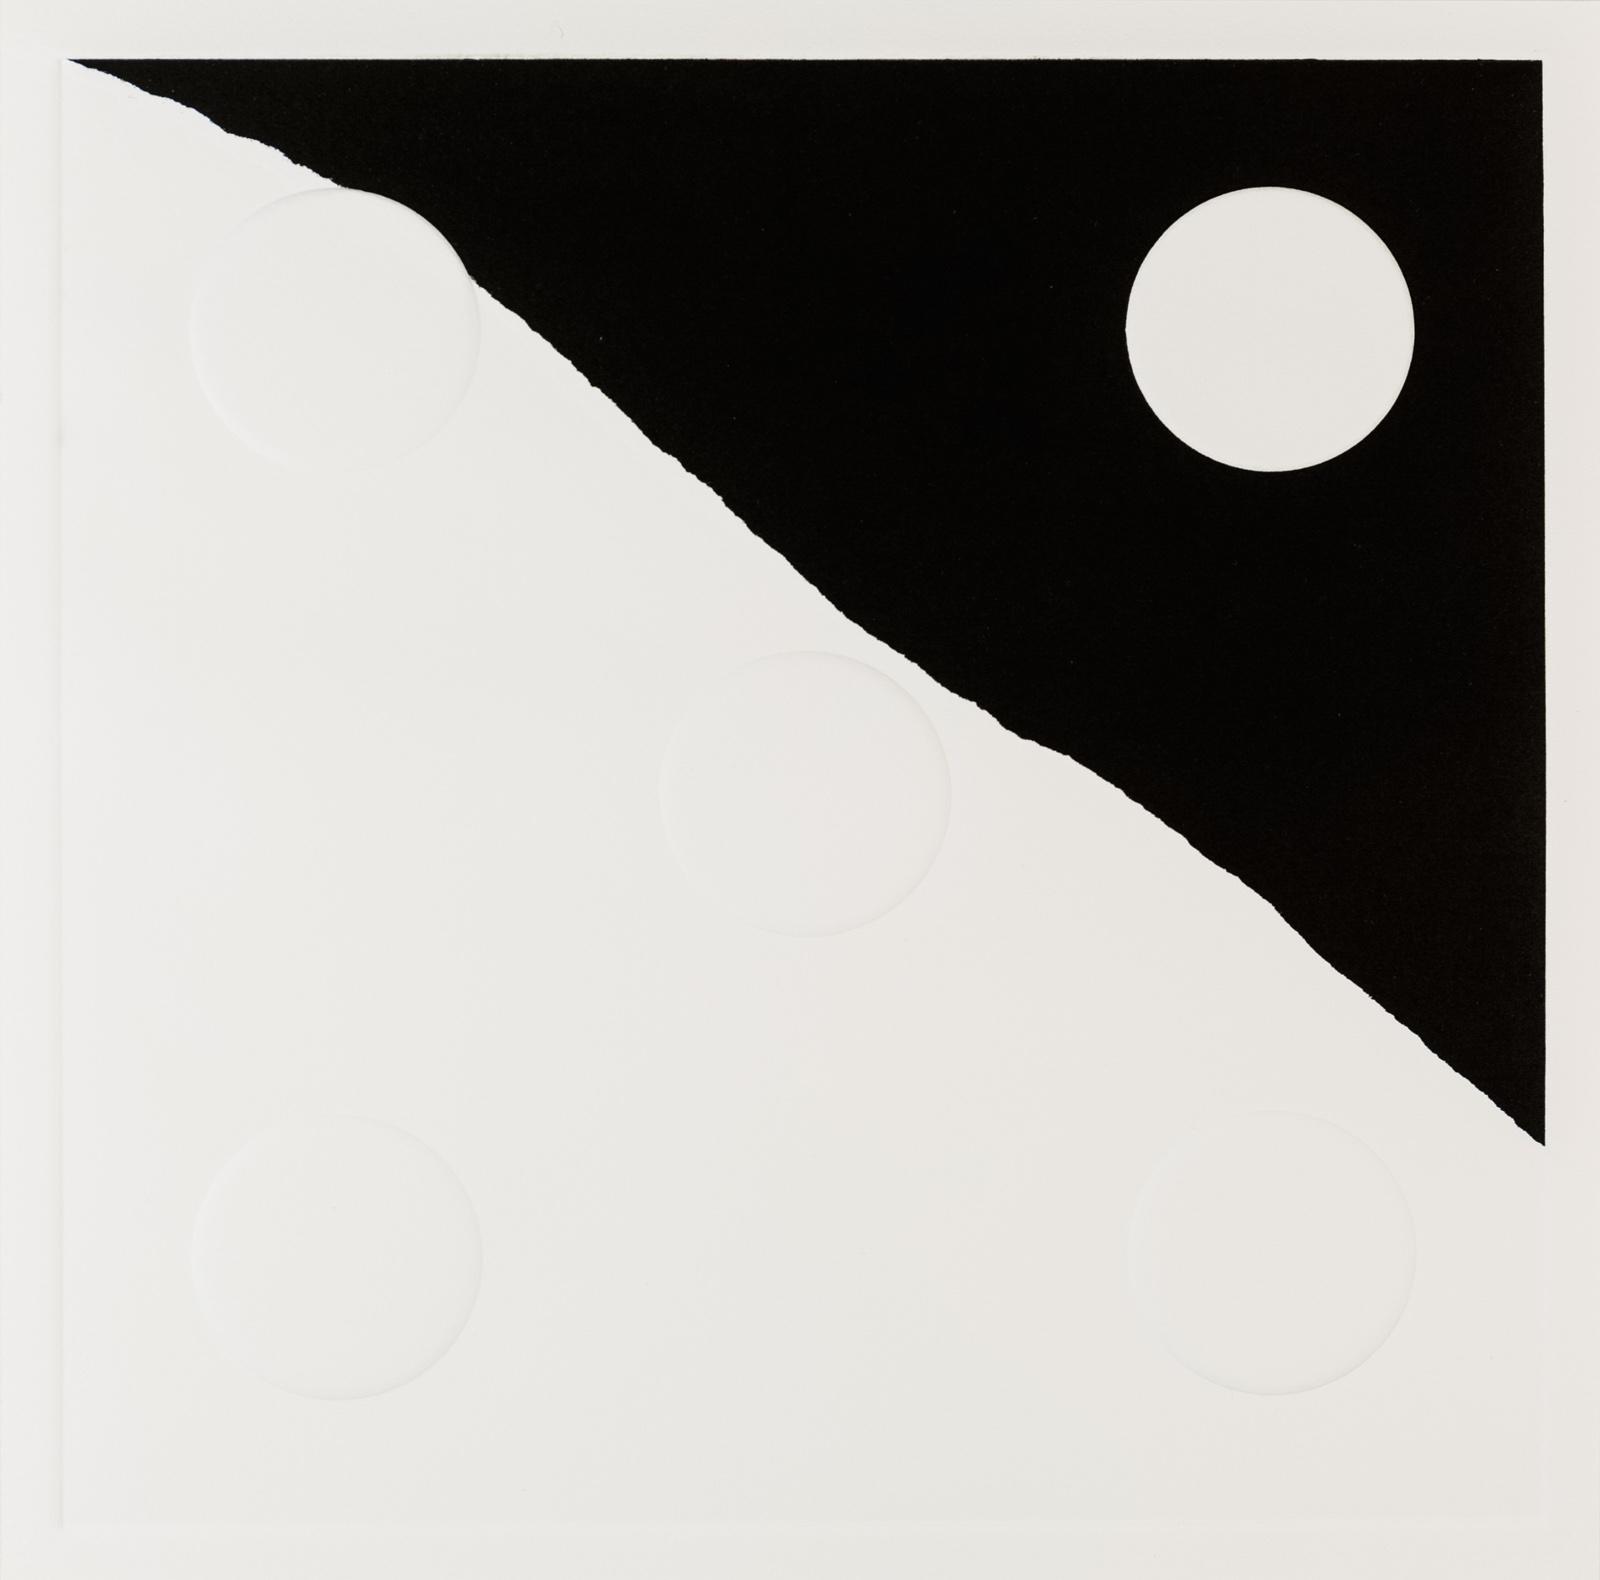 Kristina Matousch, What Lies Ahead 5, 2017, Unique print from an edition of 8, 31,5 x 31,5 cm